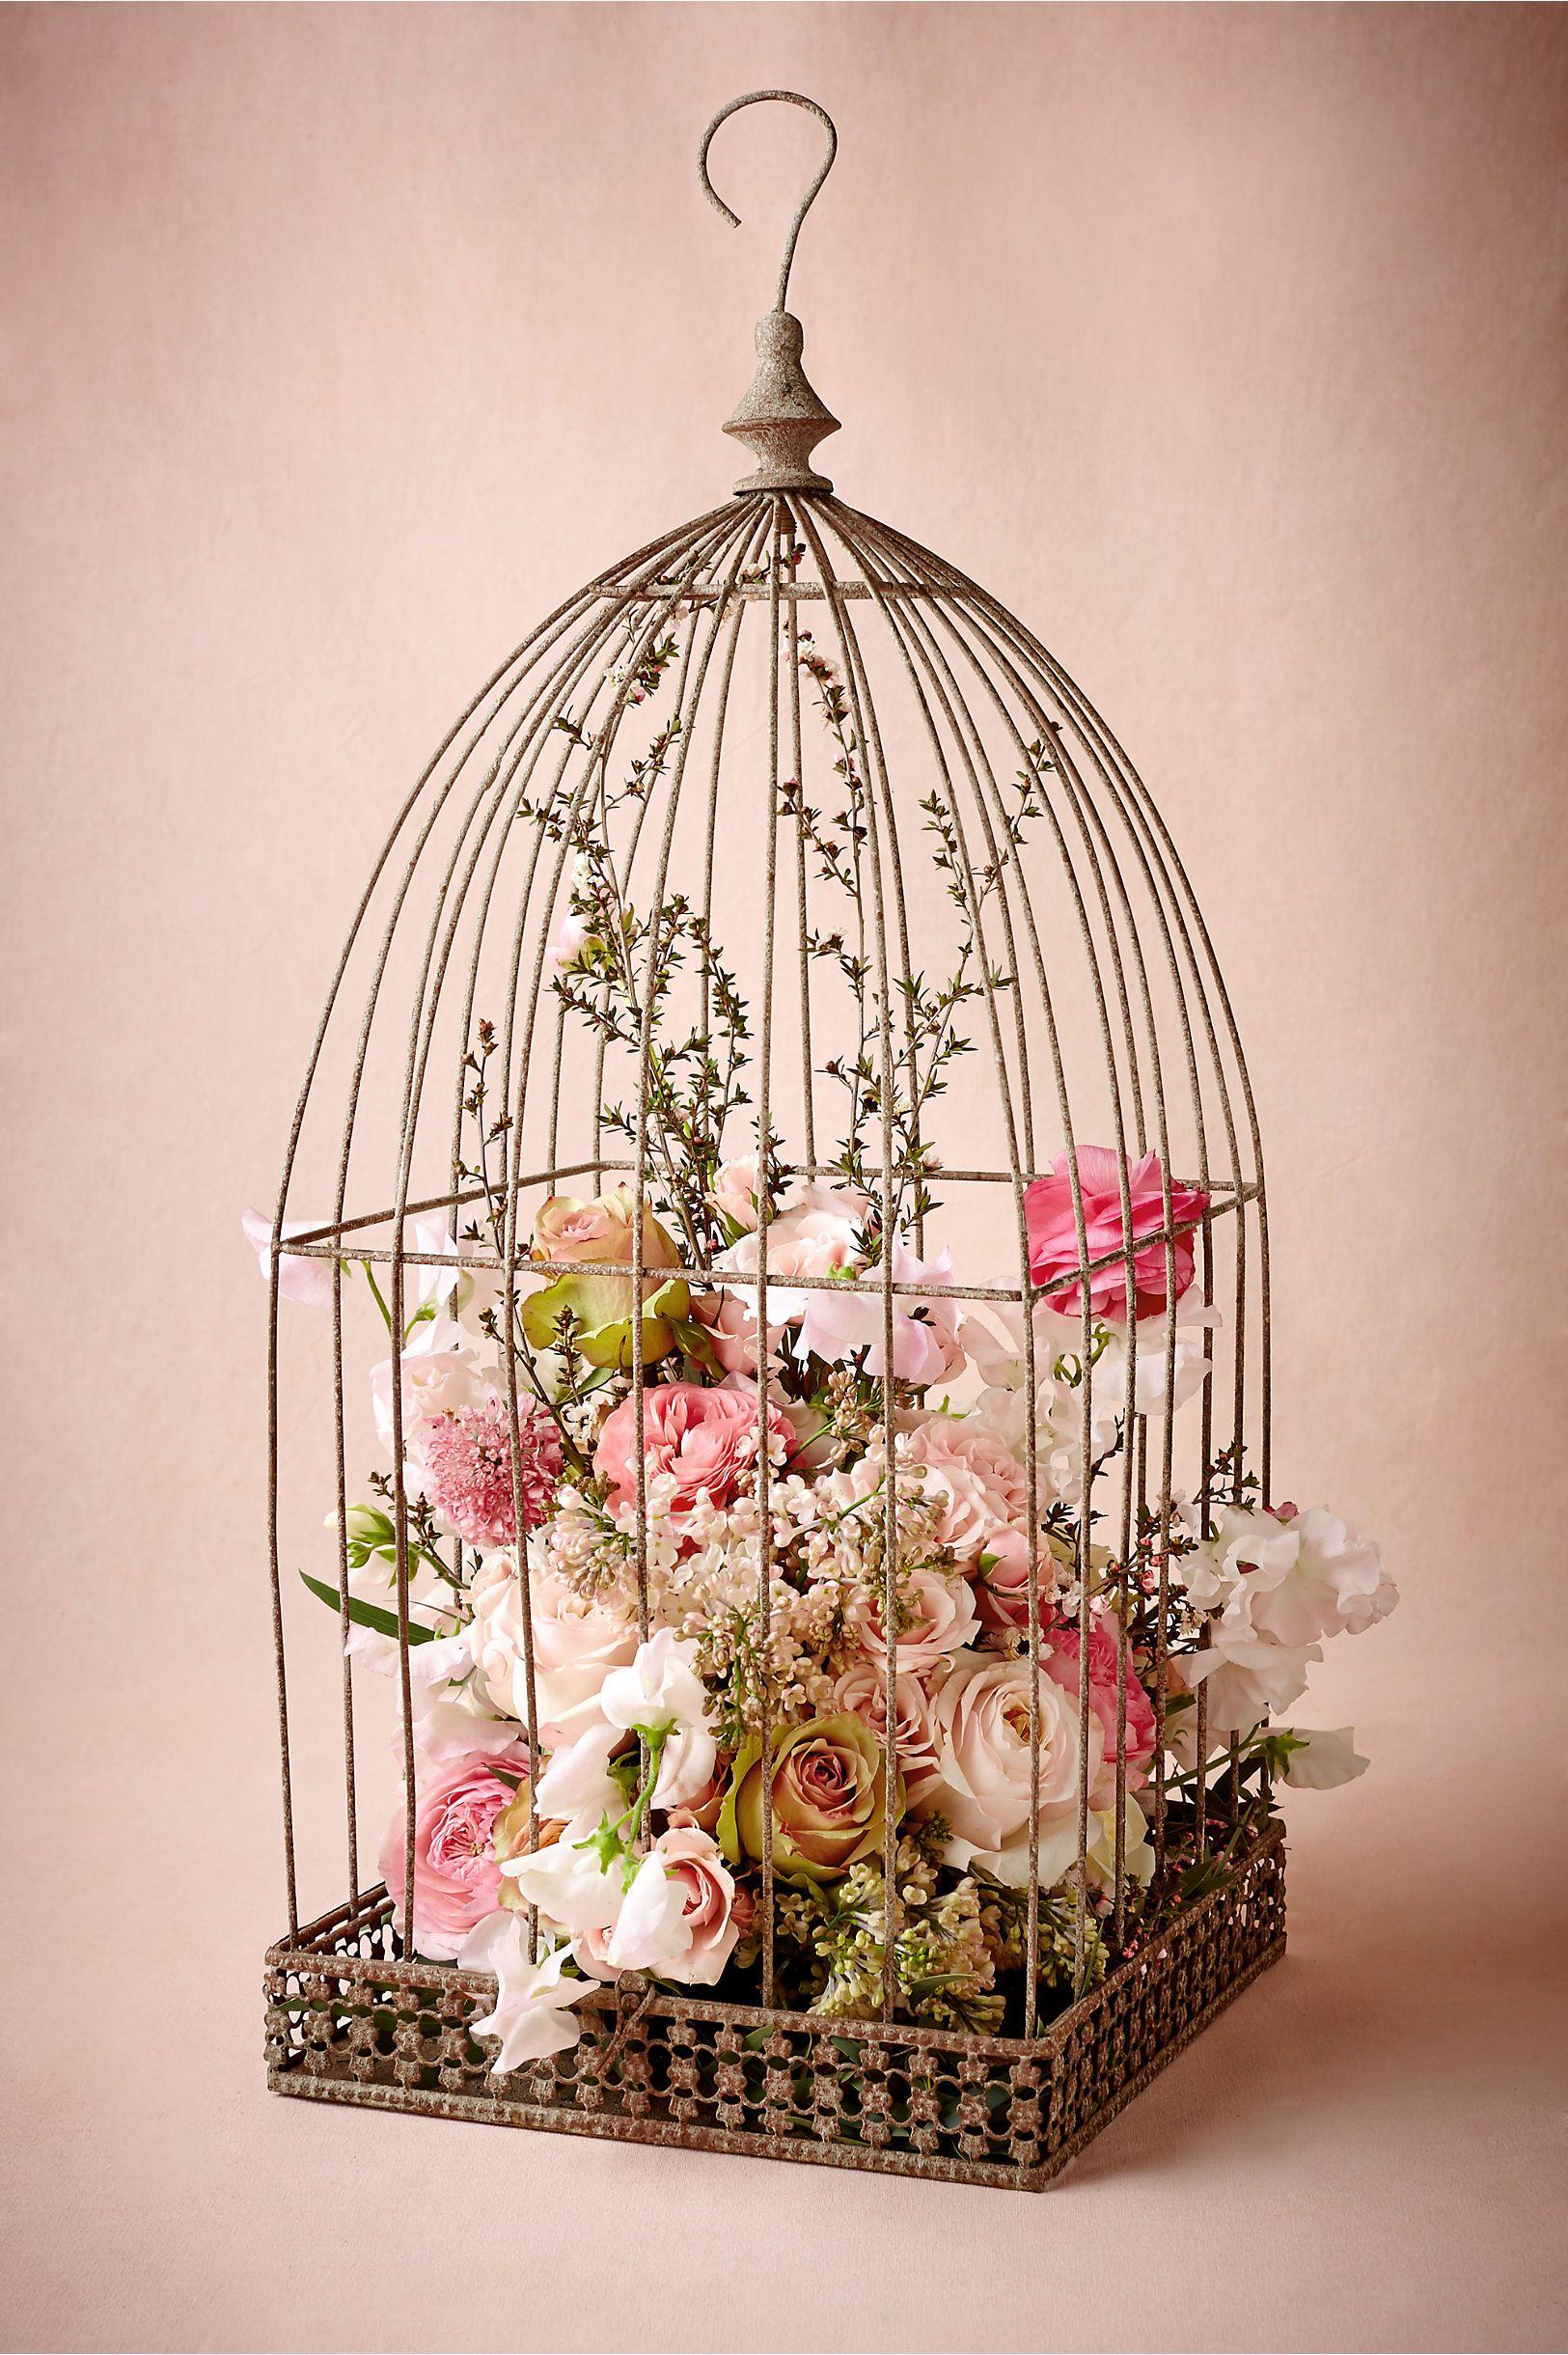 birdcage with flowers botanical bridal shower centerpiece bbat